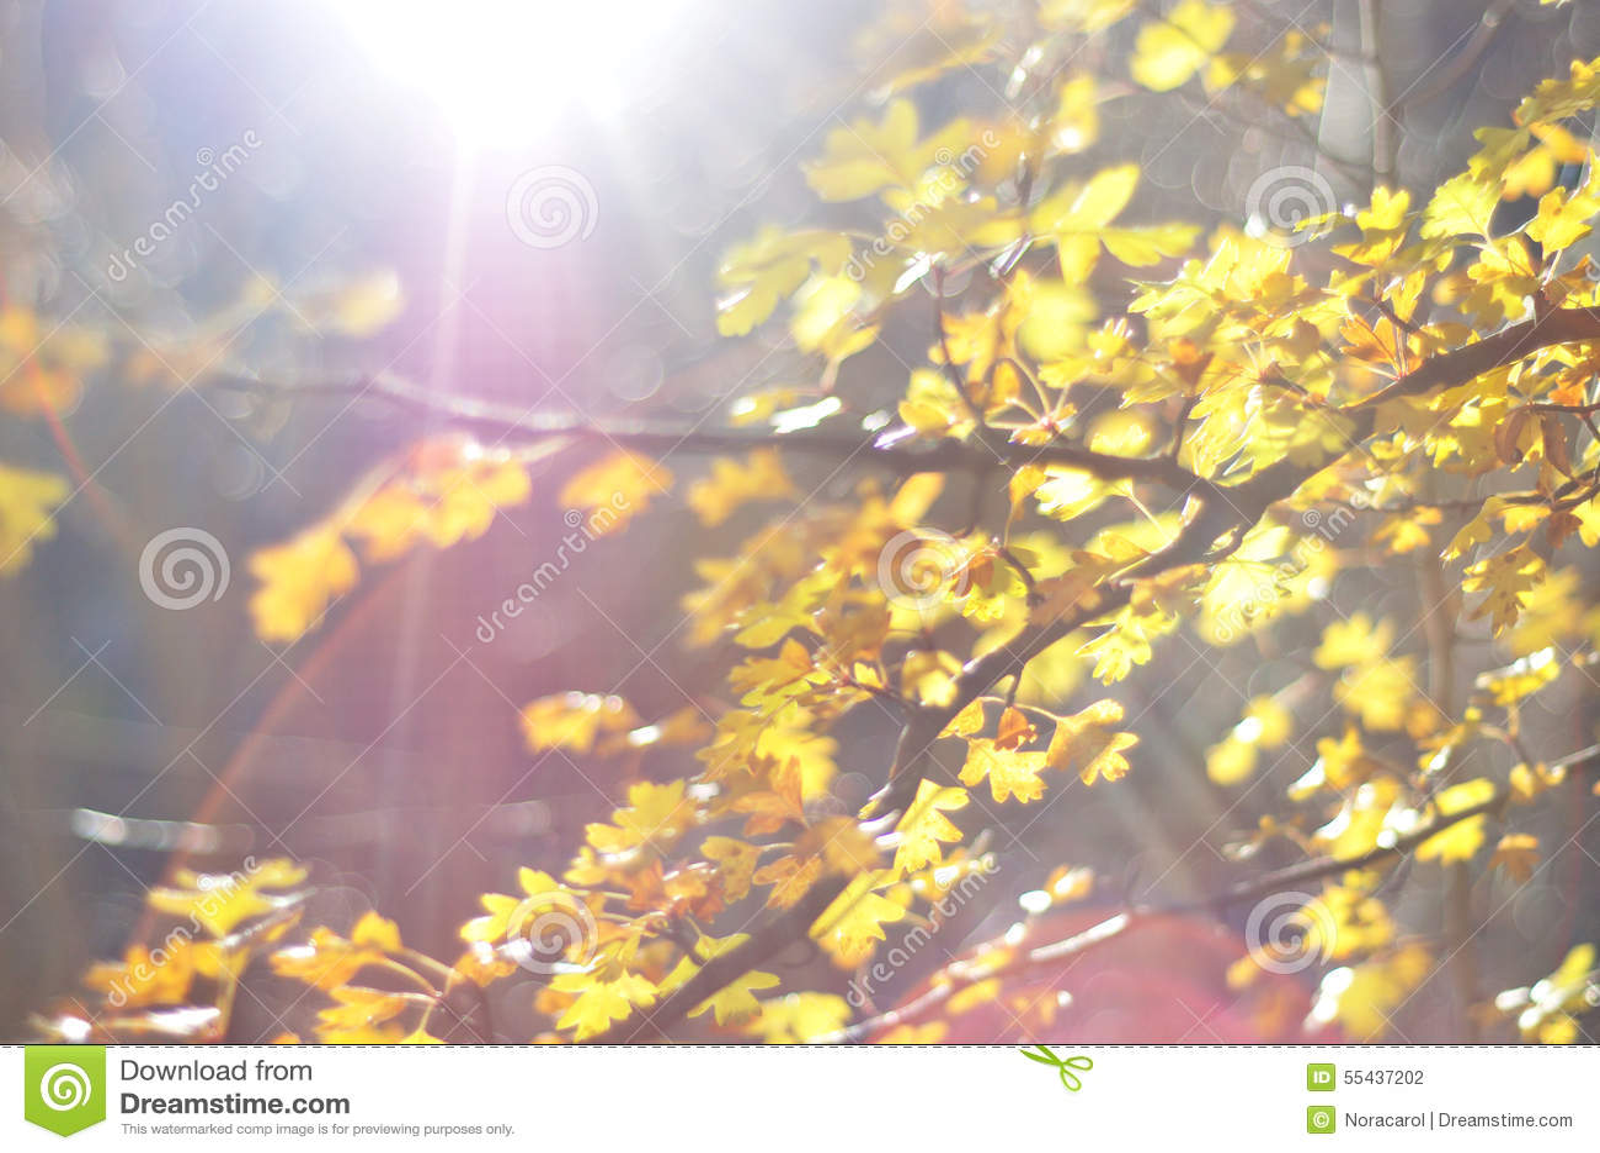 Autumn leaves with sunbeam